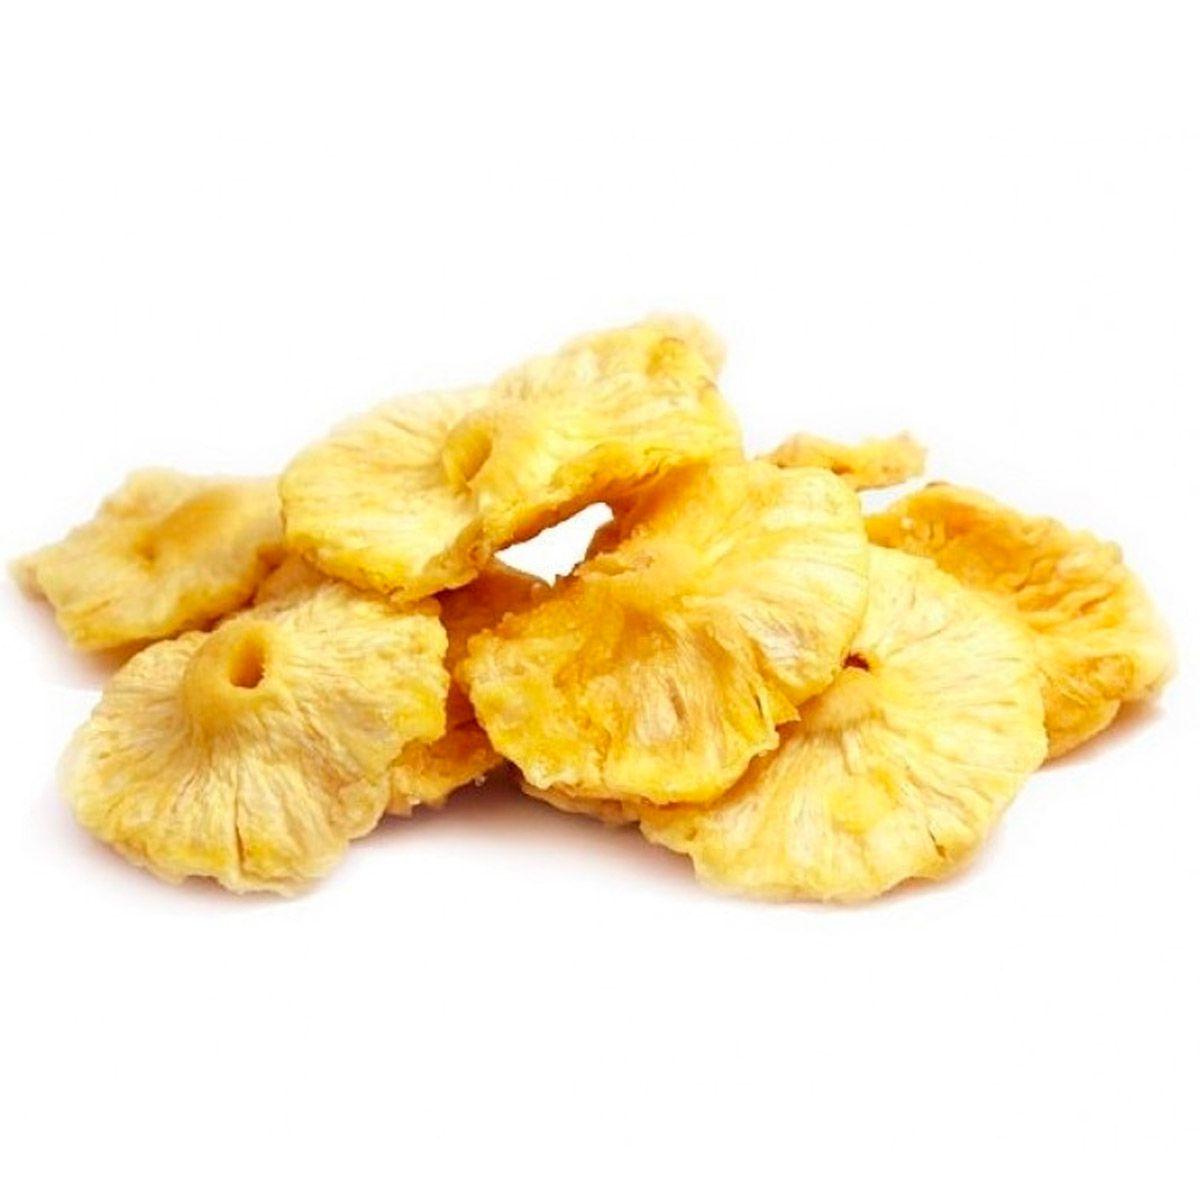 Abacaxi Seco Rodelas (Granel) 1kg  - Esverdeando